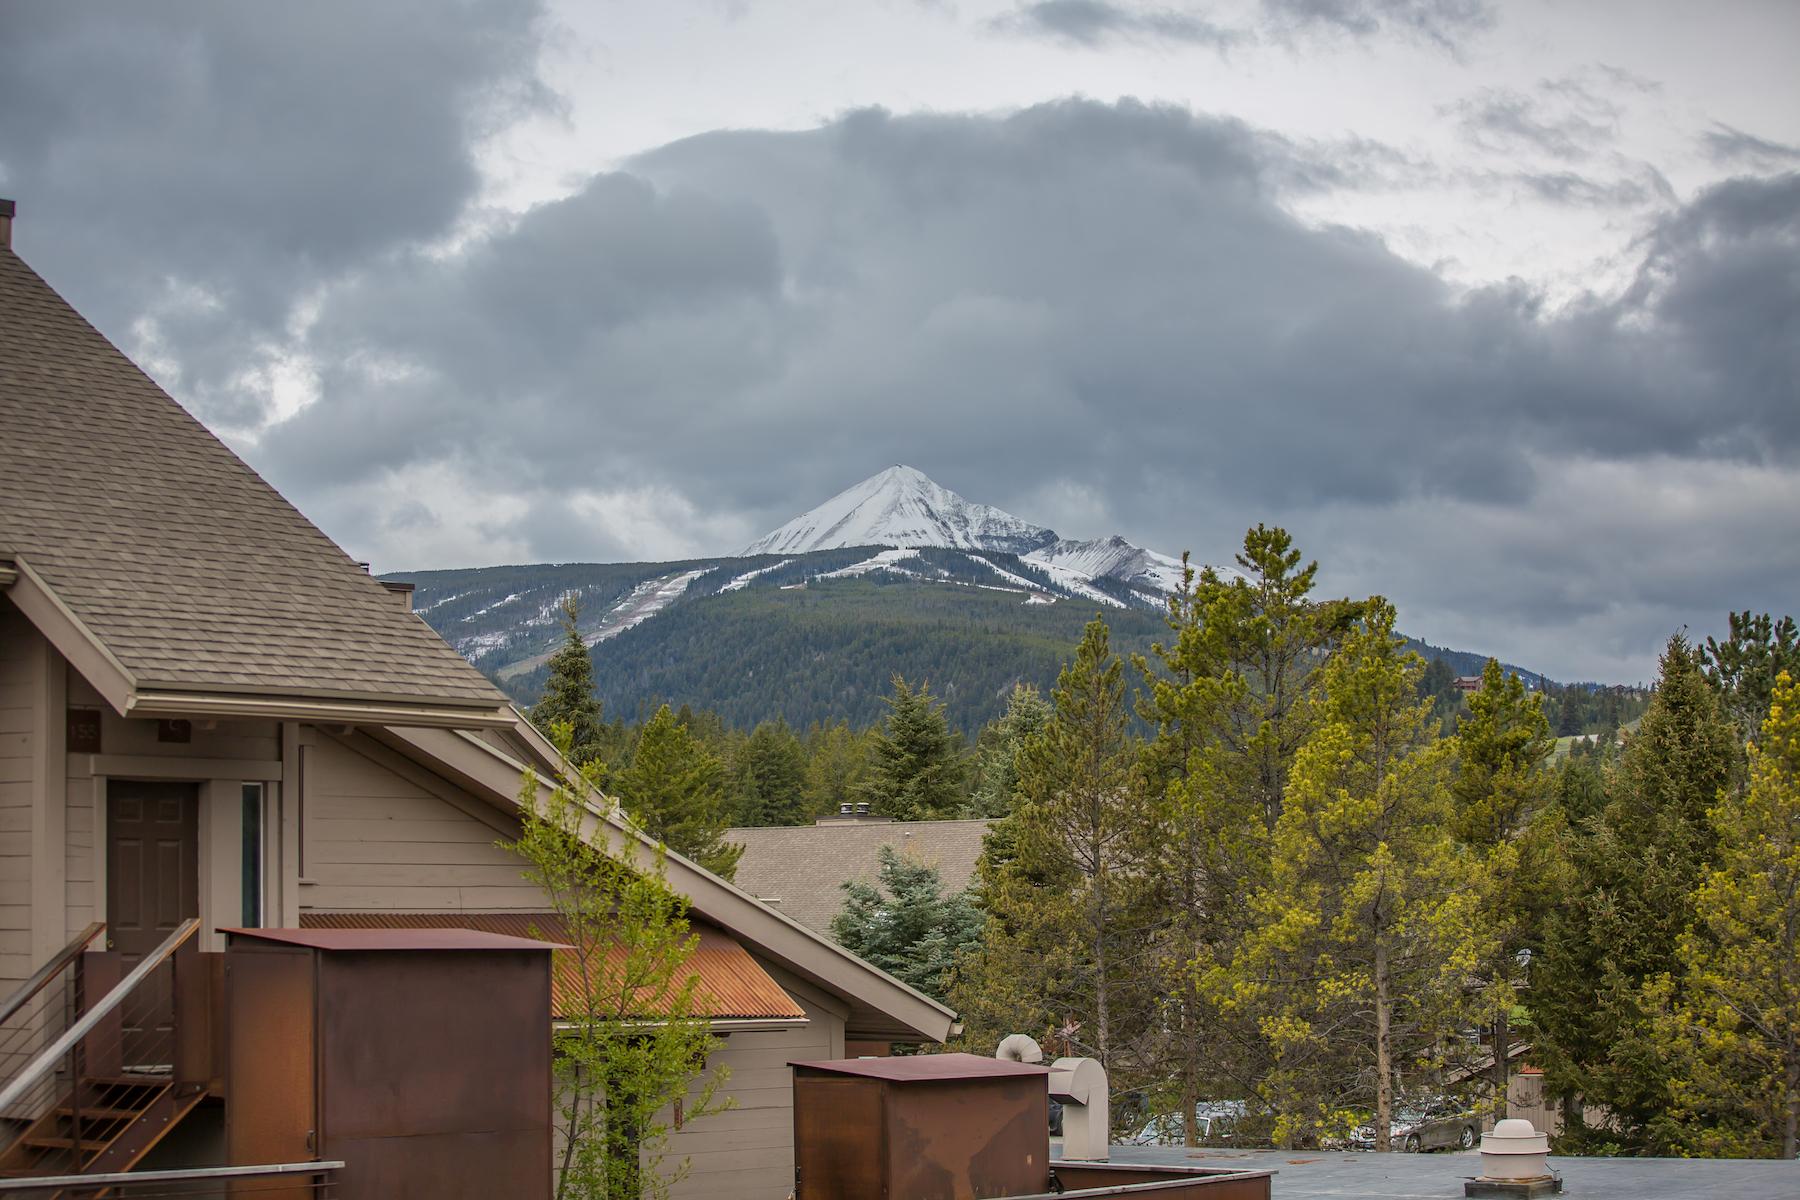 共管物業 為 出售 在 Glacier Condo 2575 Curley Bear, Glacier 150 Big Sky, 蒙大拿州, 59716 美國